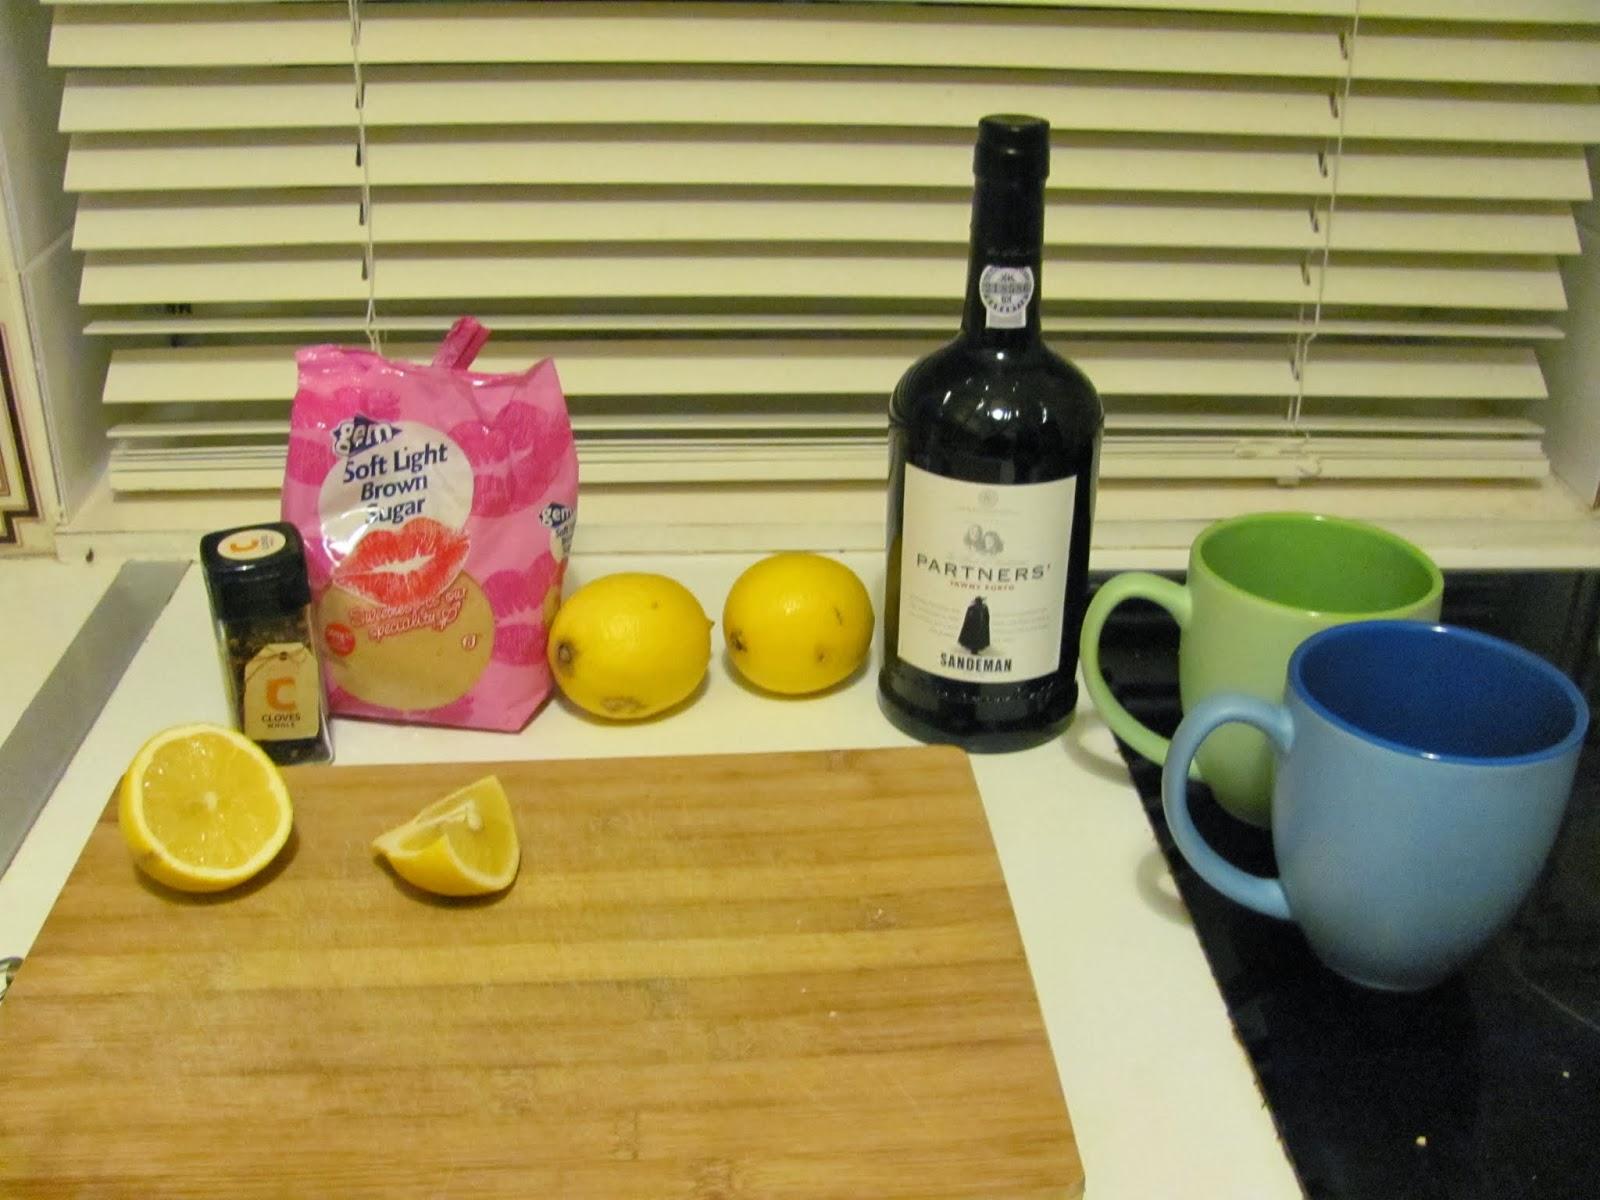 Port, Cloves, Lemons, and Sugar for hot port